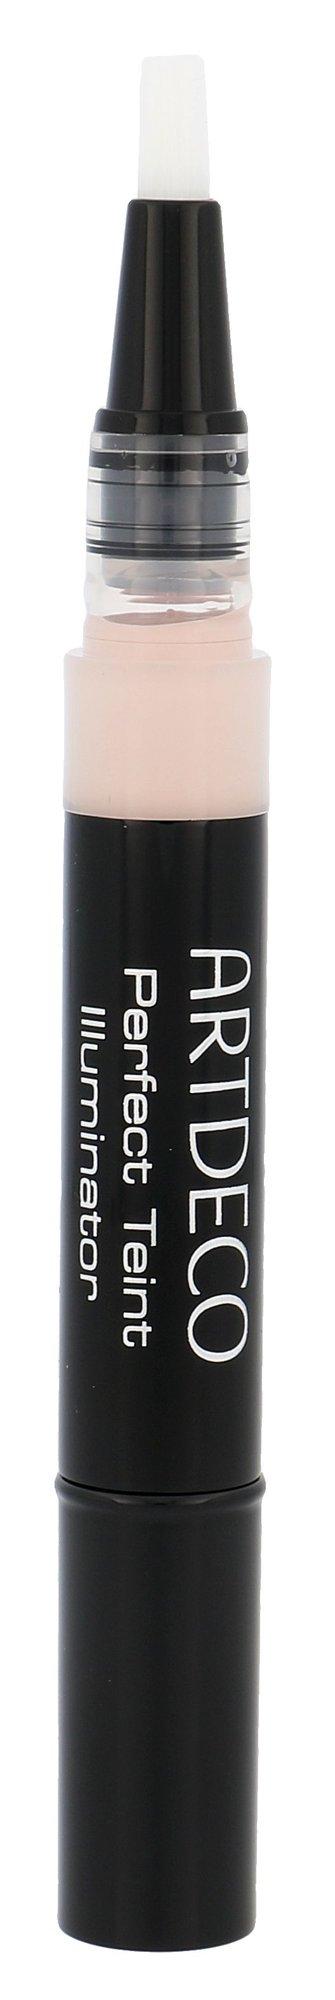 Artdeco Perfect Teint Cosmetic 2ml 1 Illuminating Pink